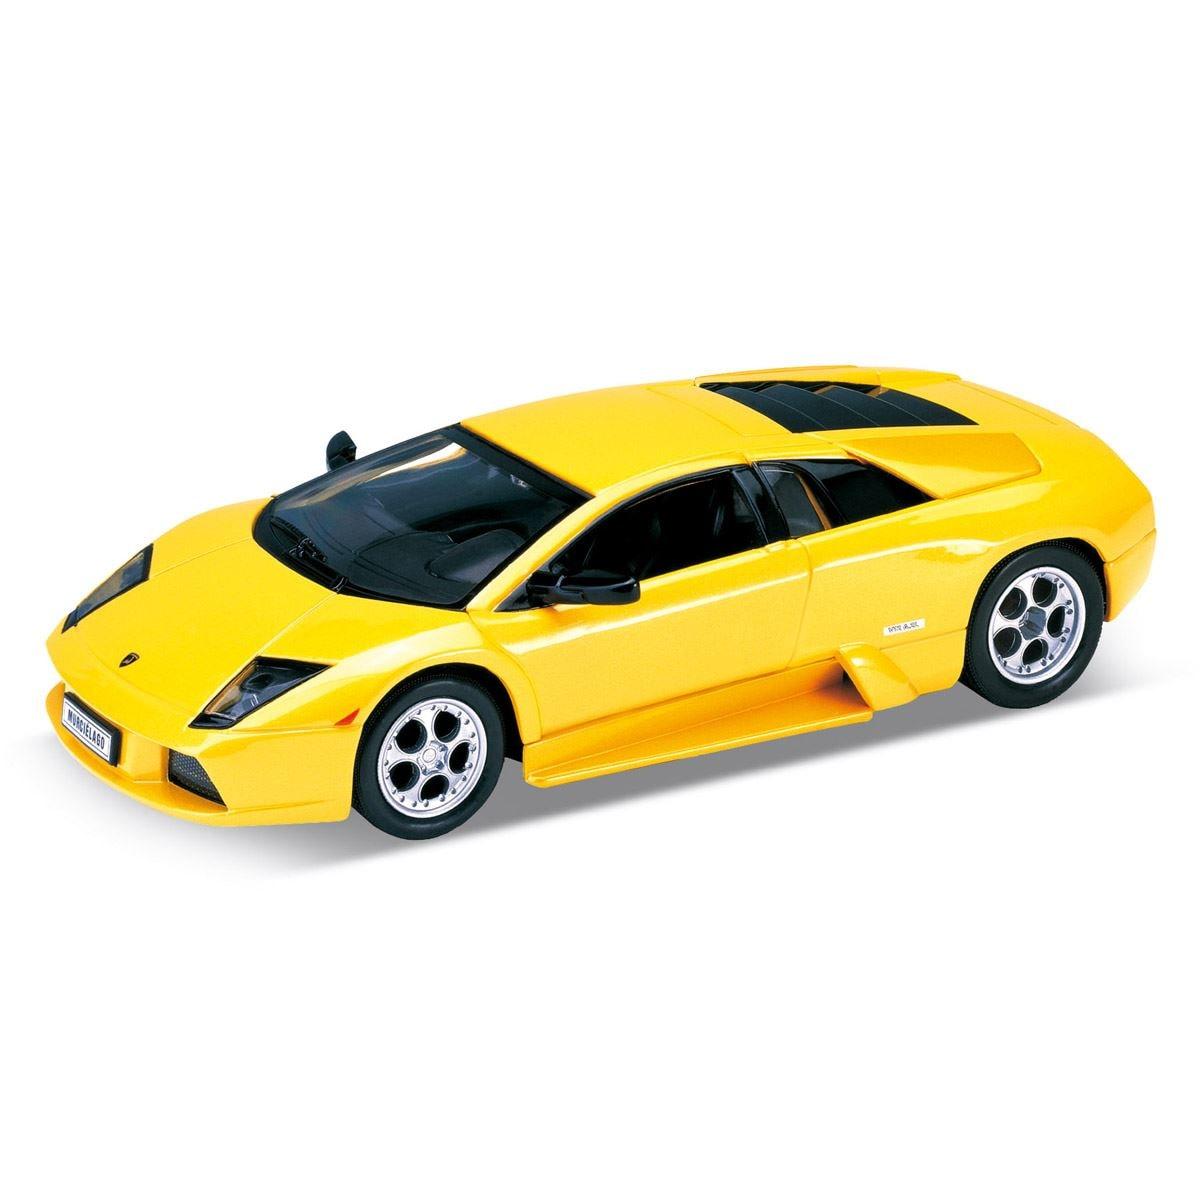 Lamborghini Murcielago esc. 1:24